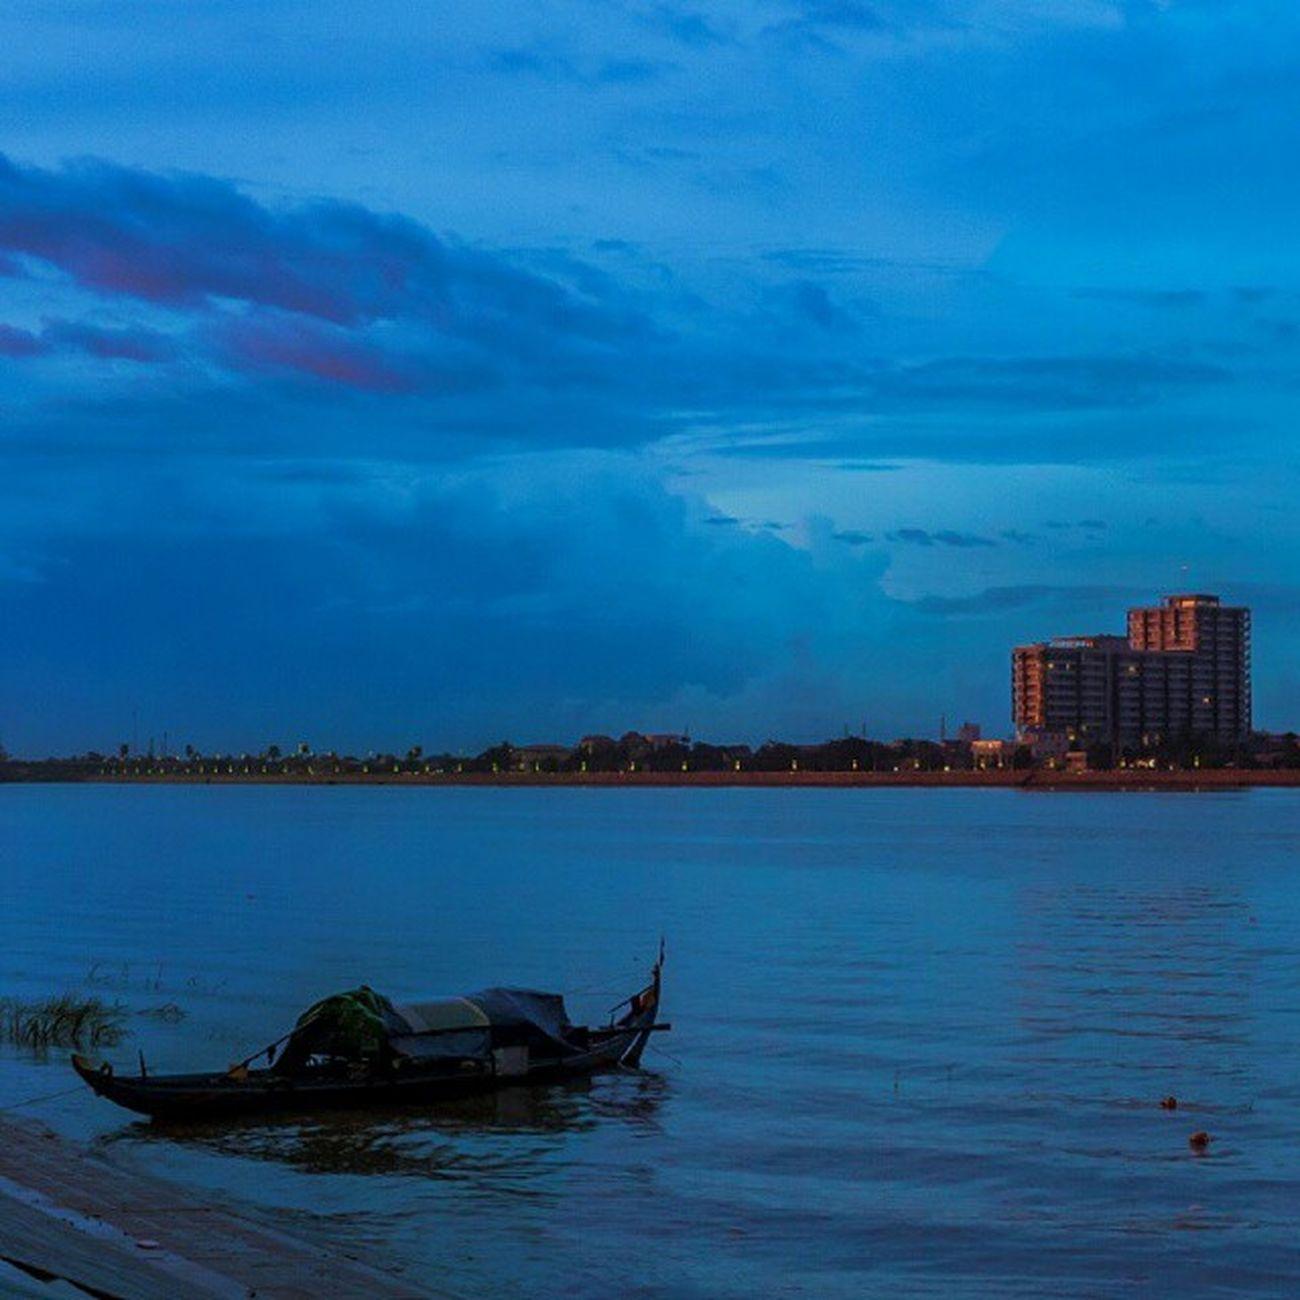 Somewhere In Phnom Penh Phnom Penh River Mekong Mekong River Tonlesap Phnom Pehn Cambodian Only In Cambodia In Cambodia Cambodge Kampuchea Cambodia Cambodia Tour Phnom Phnompenh. Phnompenh